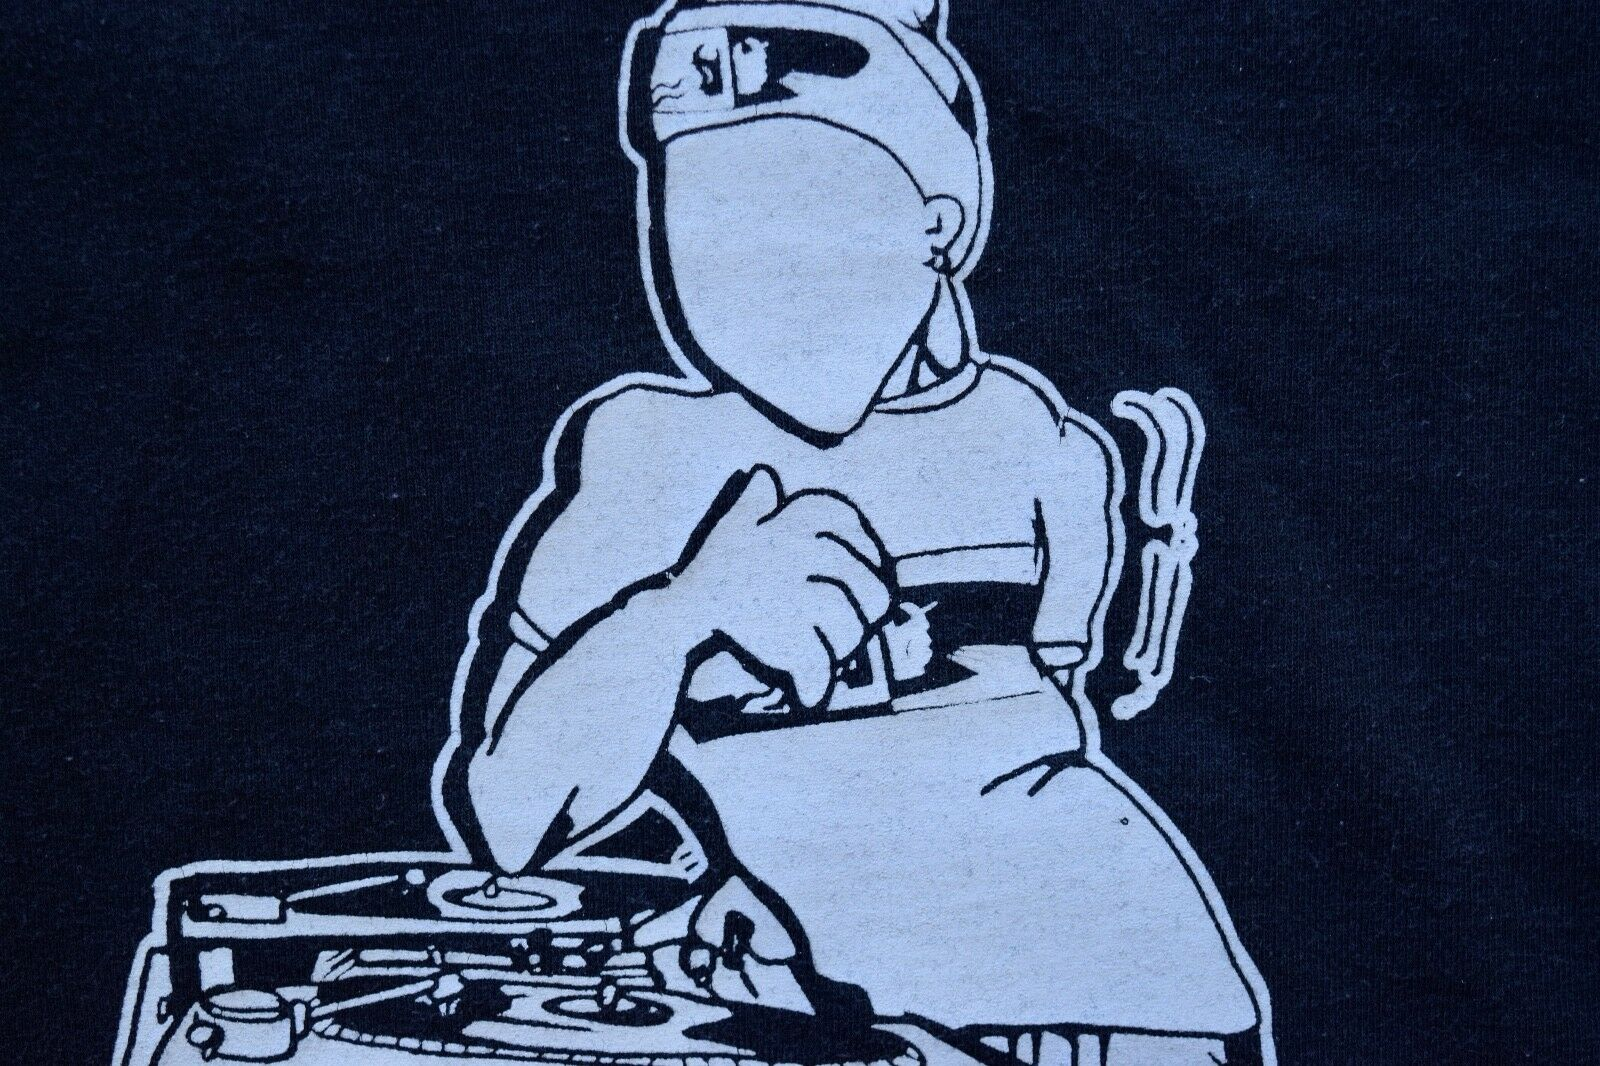 1991 DMC international DJ competition vtg 90s rap hip hop T-shirt isp dj q bert